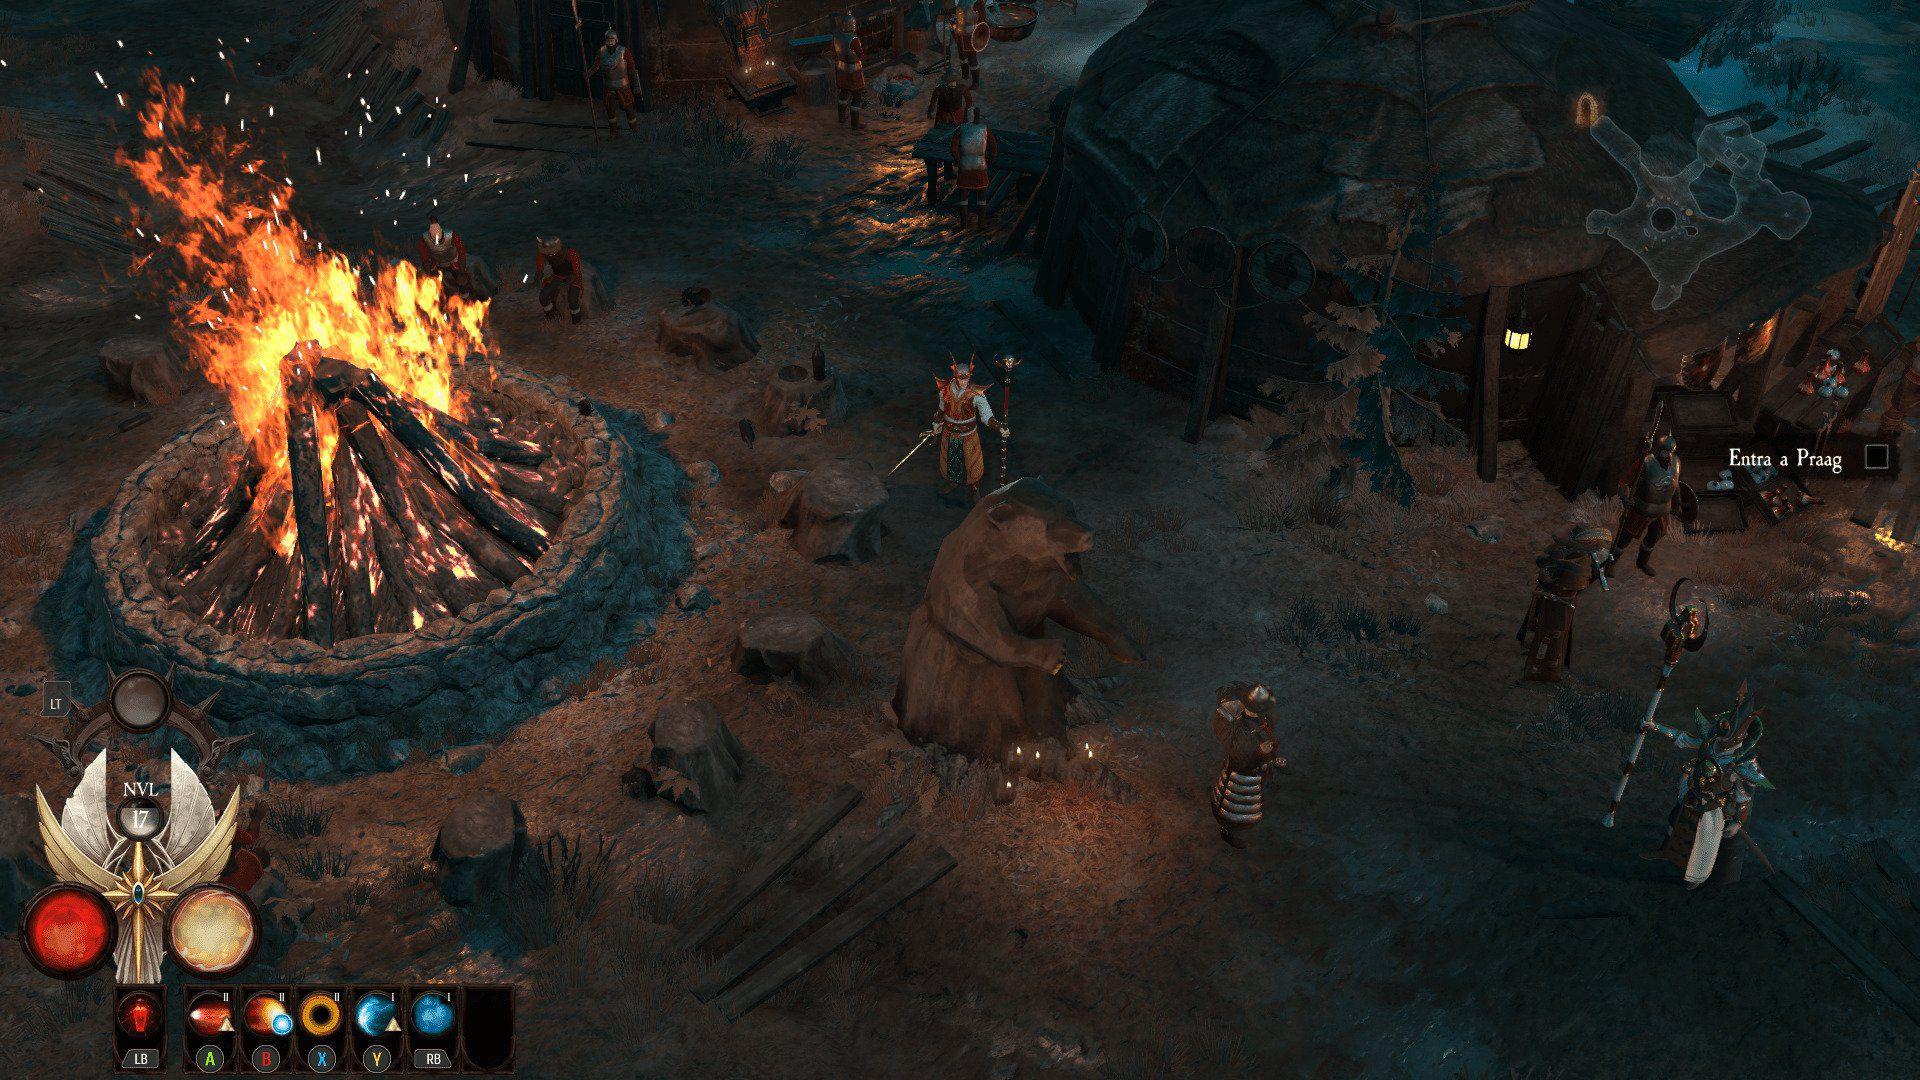 Análisis de Warhammer: Chaosbane